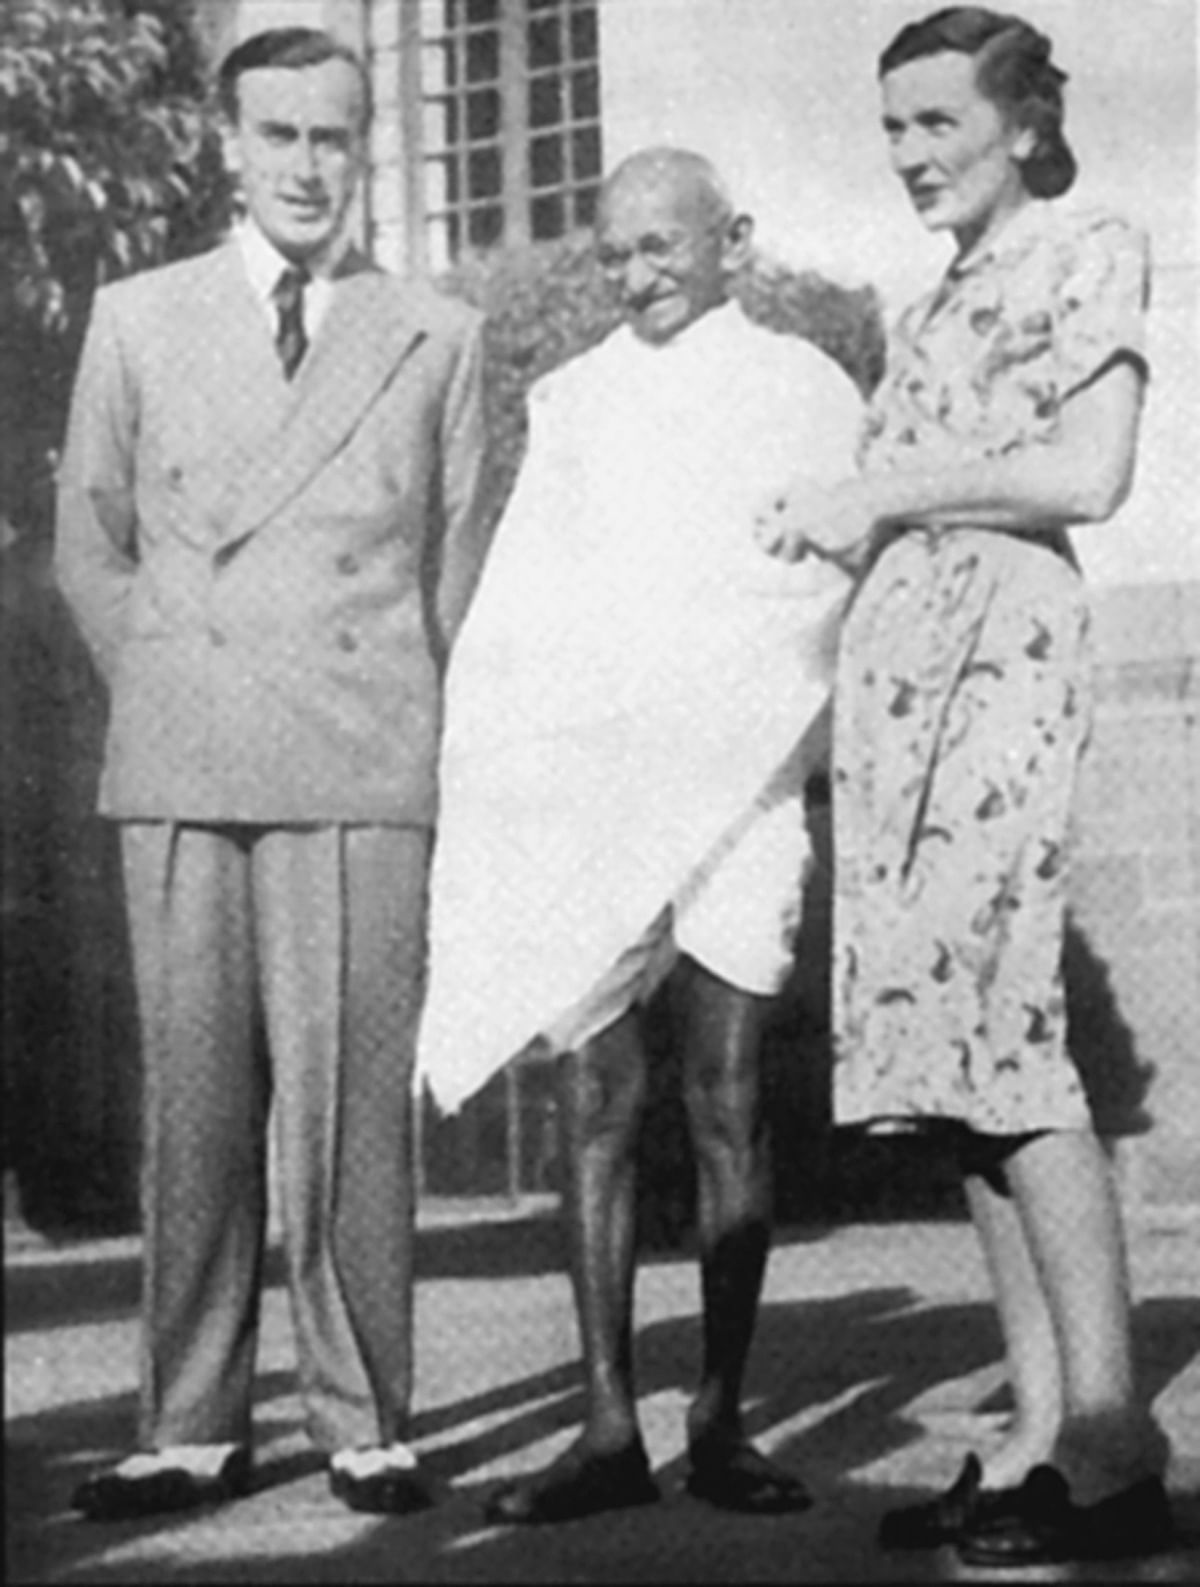 Lord Mountbatten and Mahatma gandhi